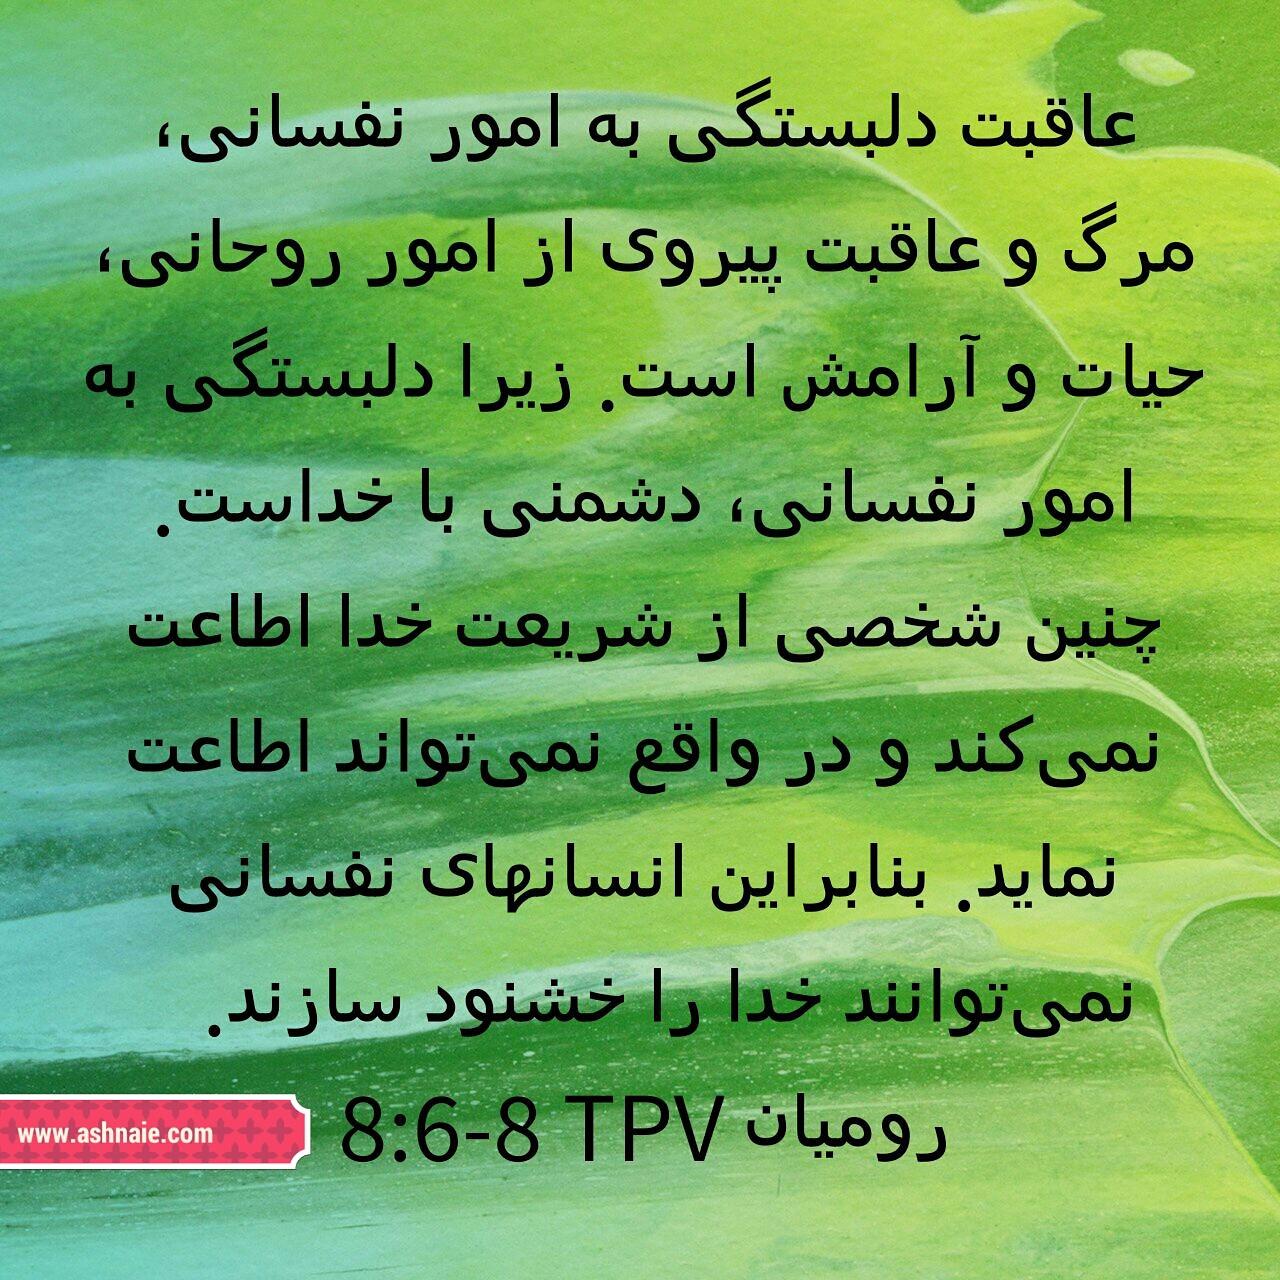 IMG_20180628_225423_488.jpg